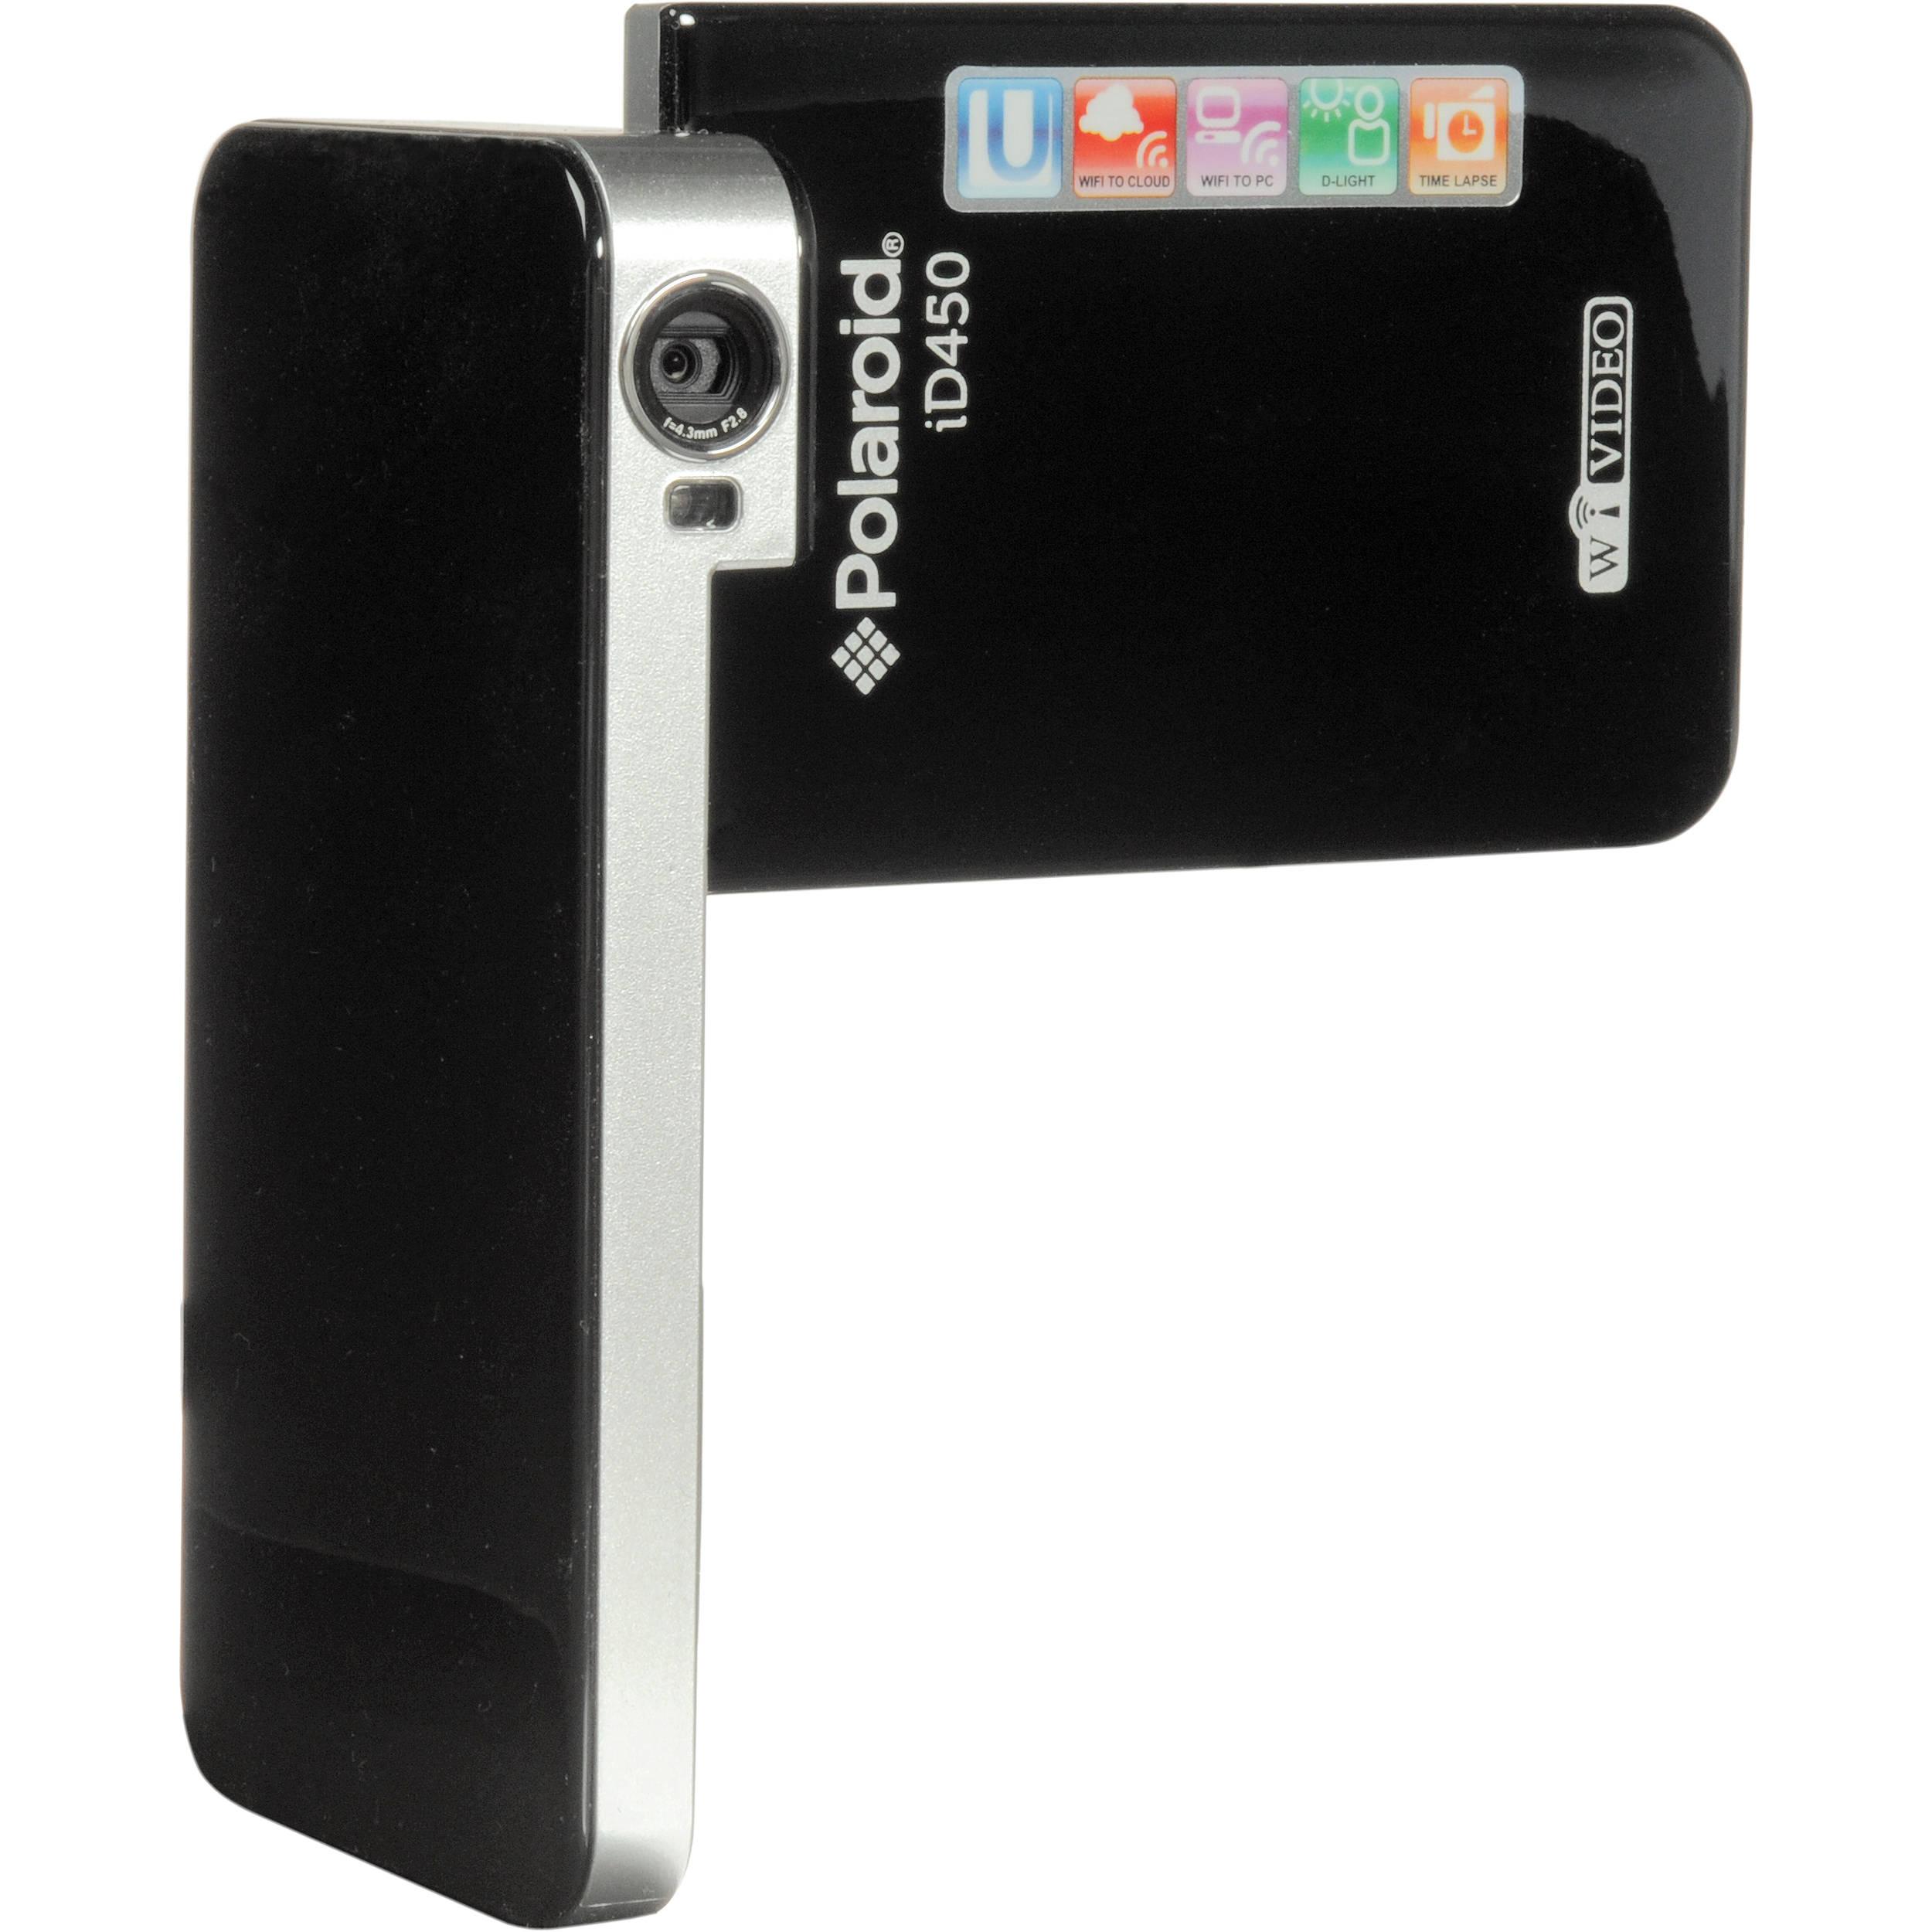 user manual polaroid camcorder